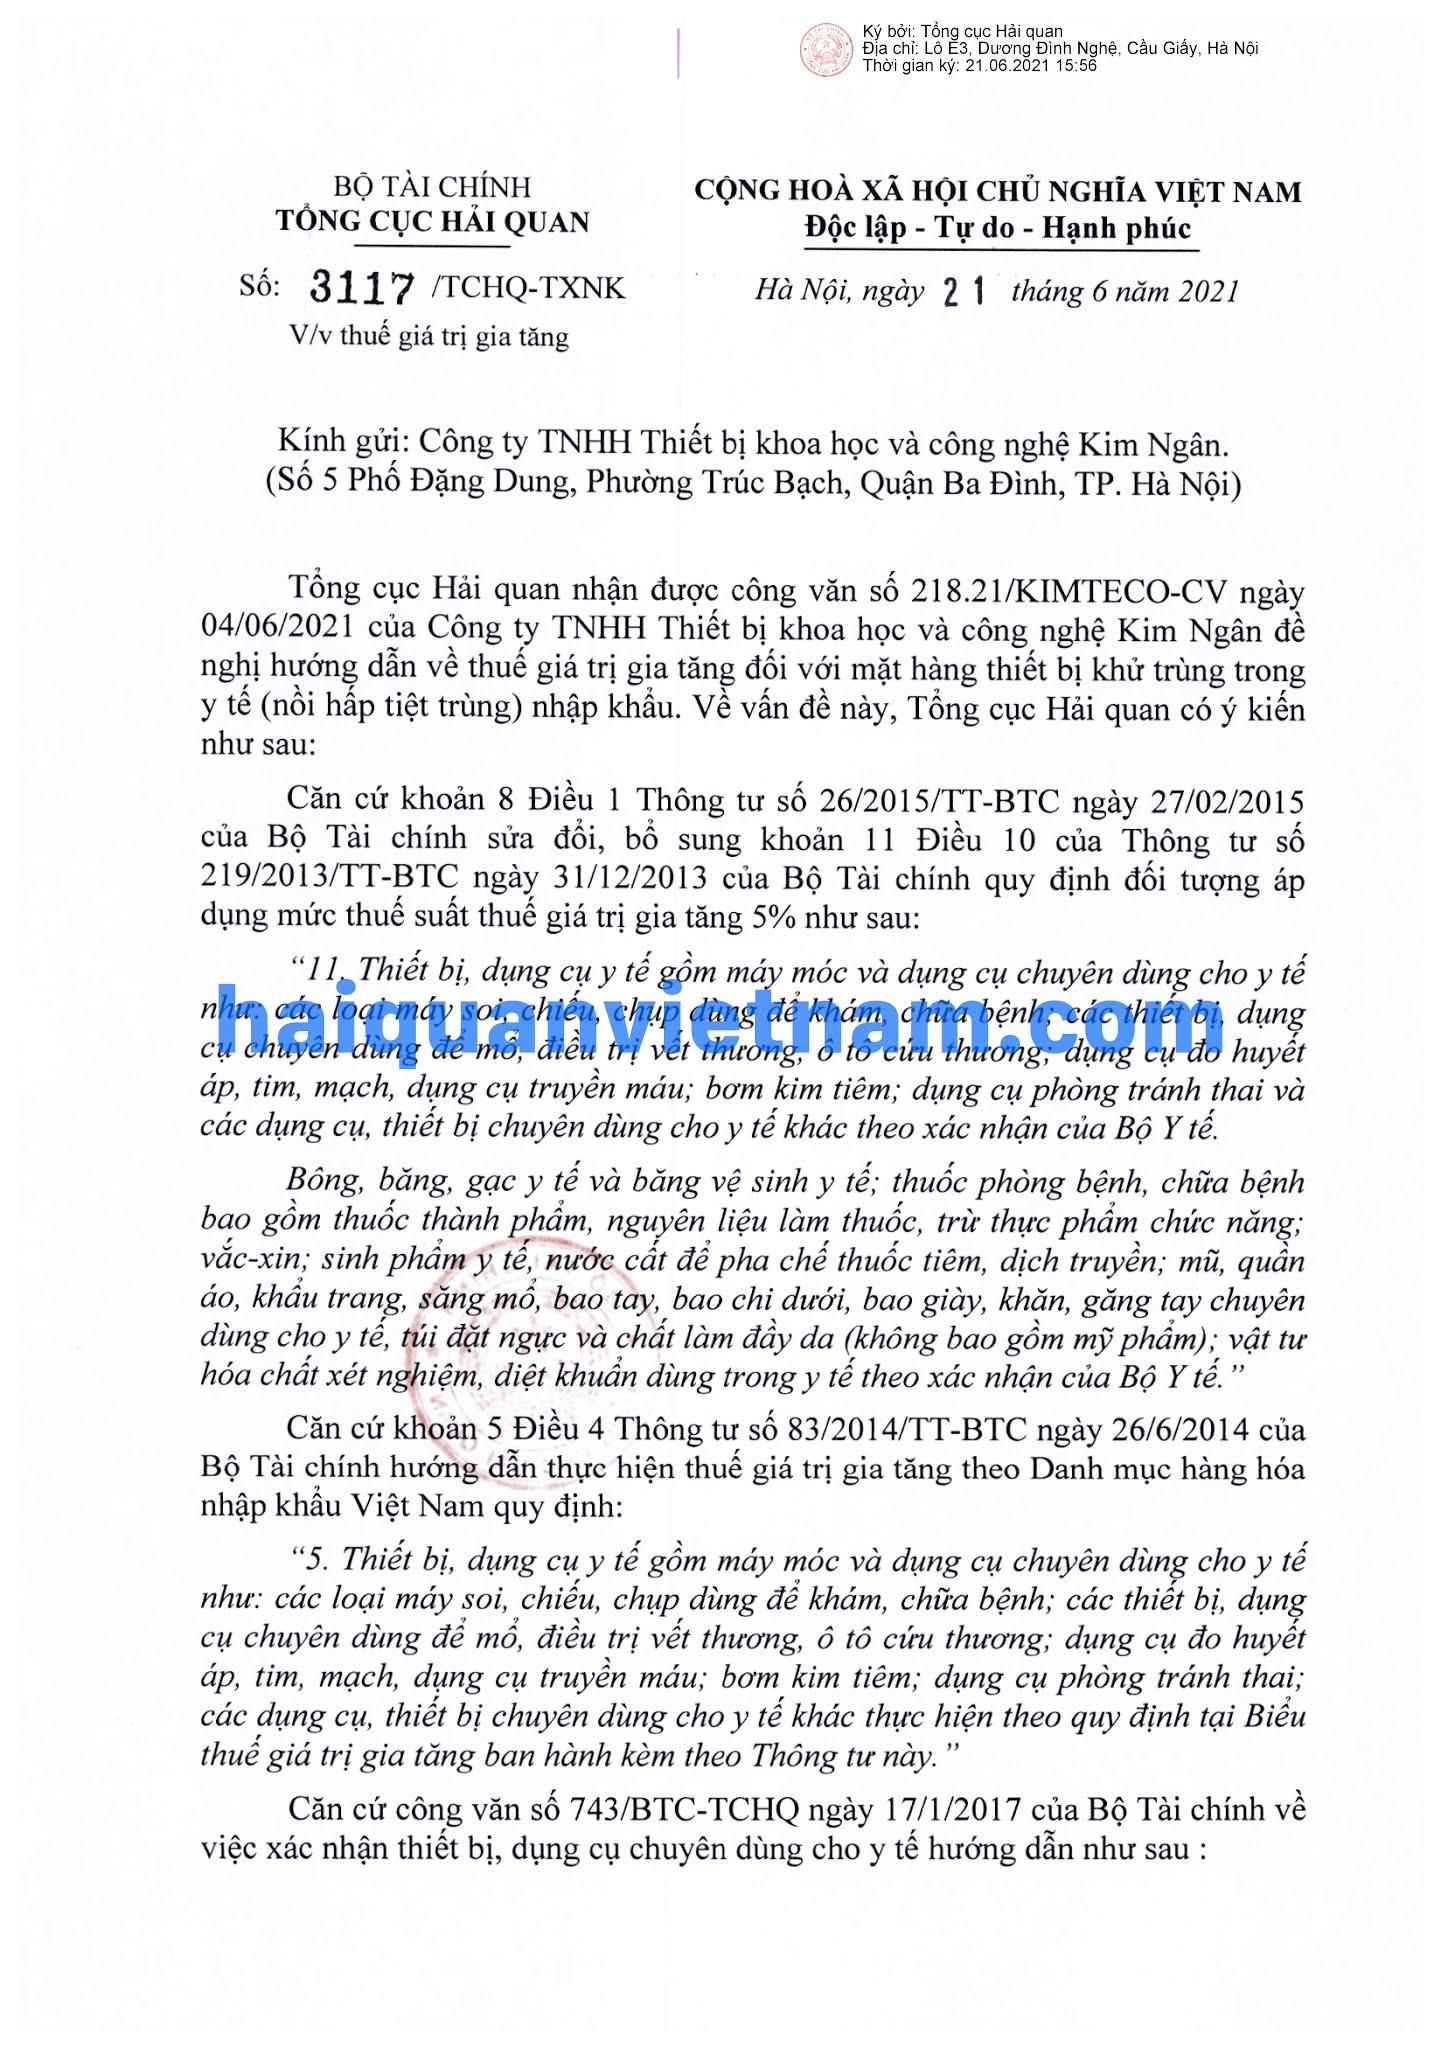 [Image: 210621_3117_TCHQ-TXNK_haiquanvietnam_01.jpg]